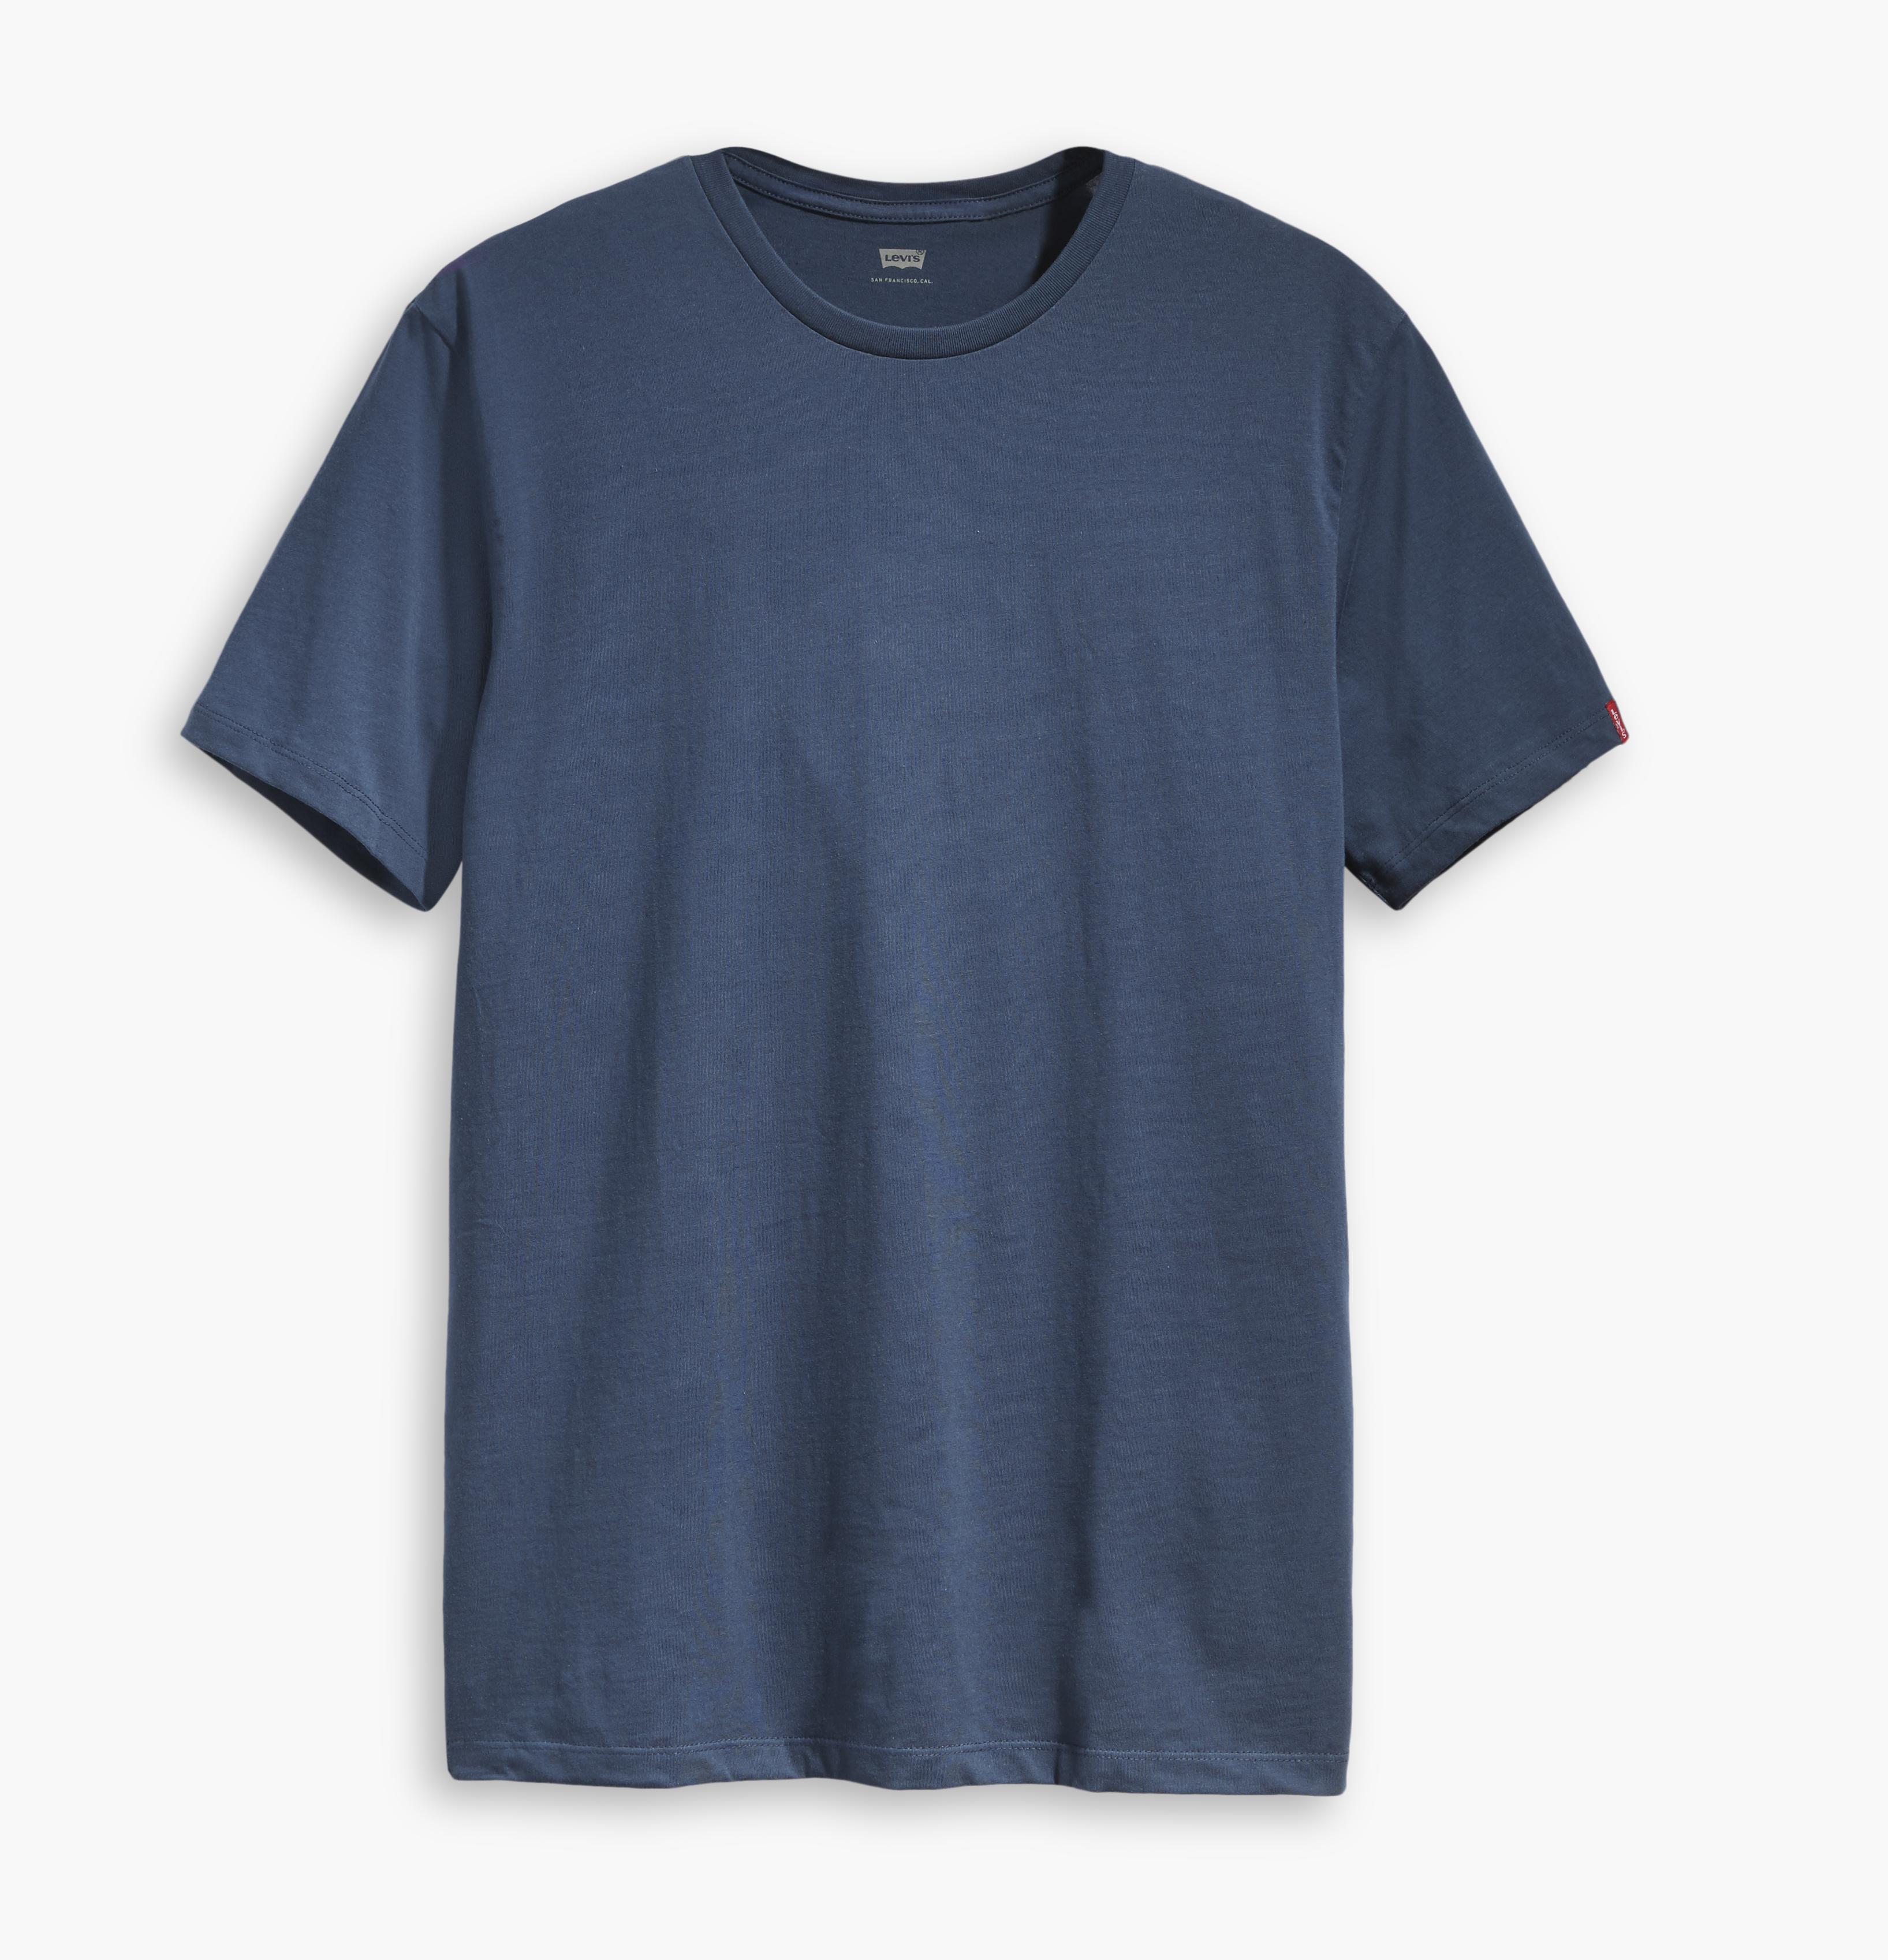 LEVIS 2er Pack Shirts Rundhals T-Shirt 82176-0004 navy W18-LVT1